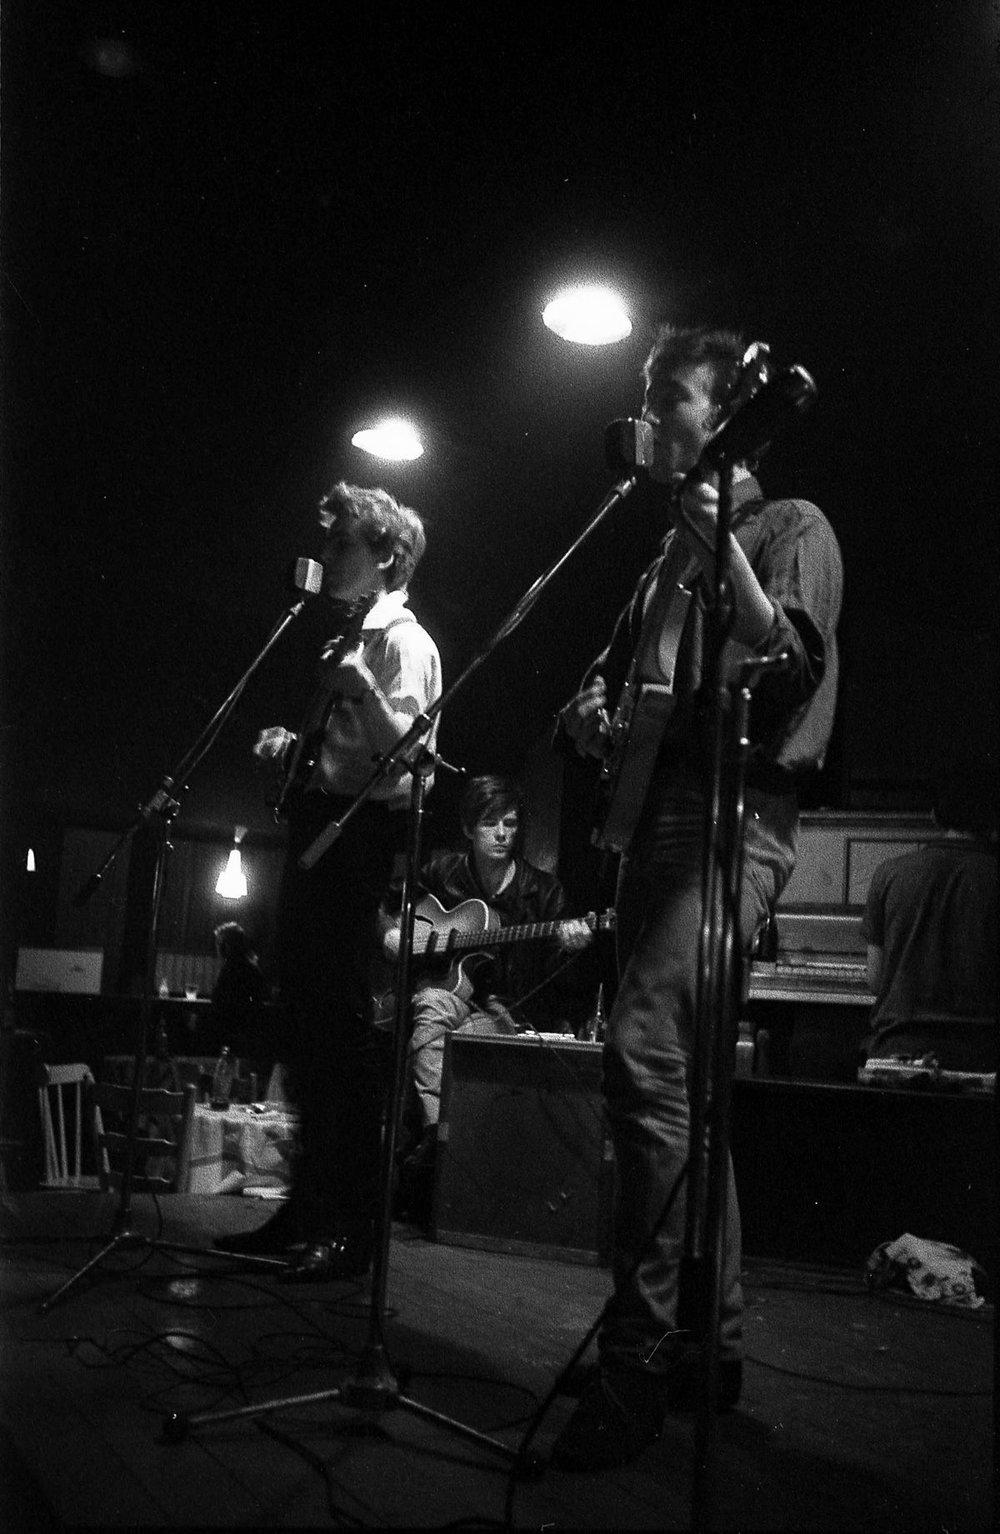 George Harrison John Lennon and Stuart Sutcliffe in Hamburg.